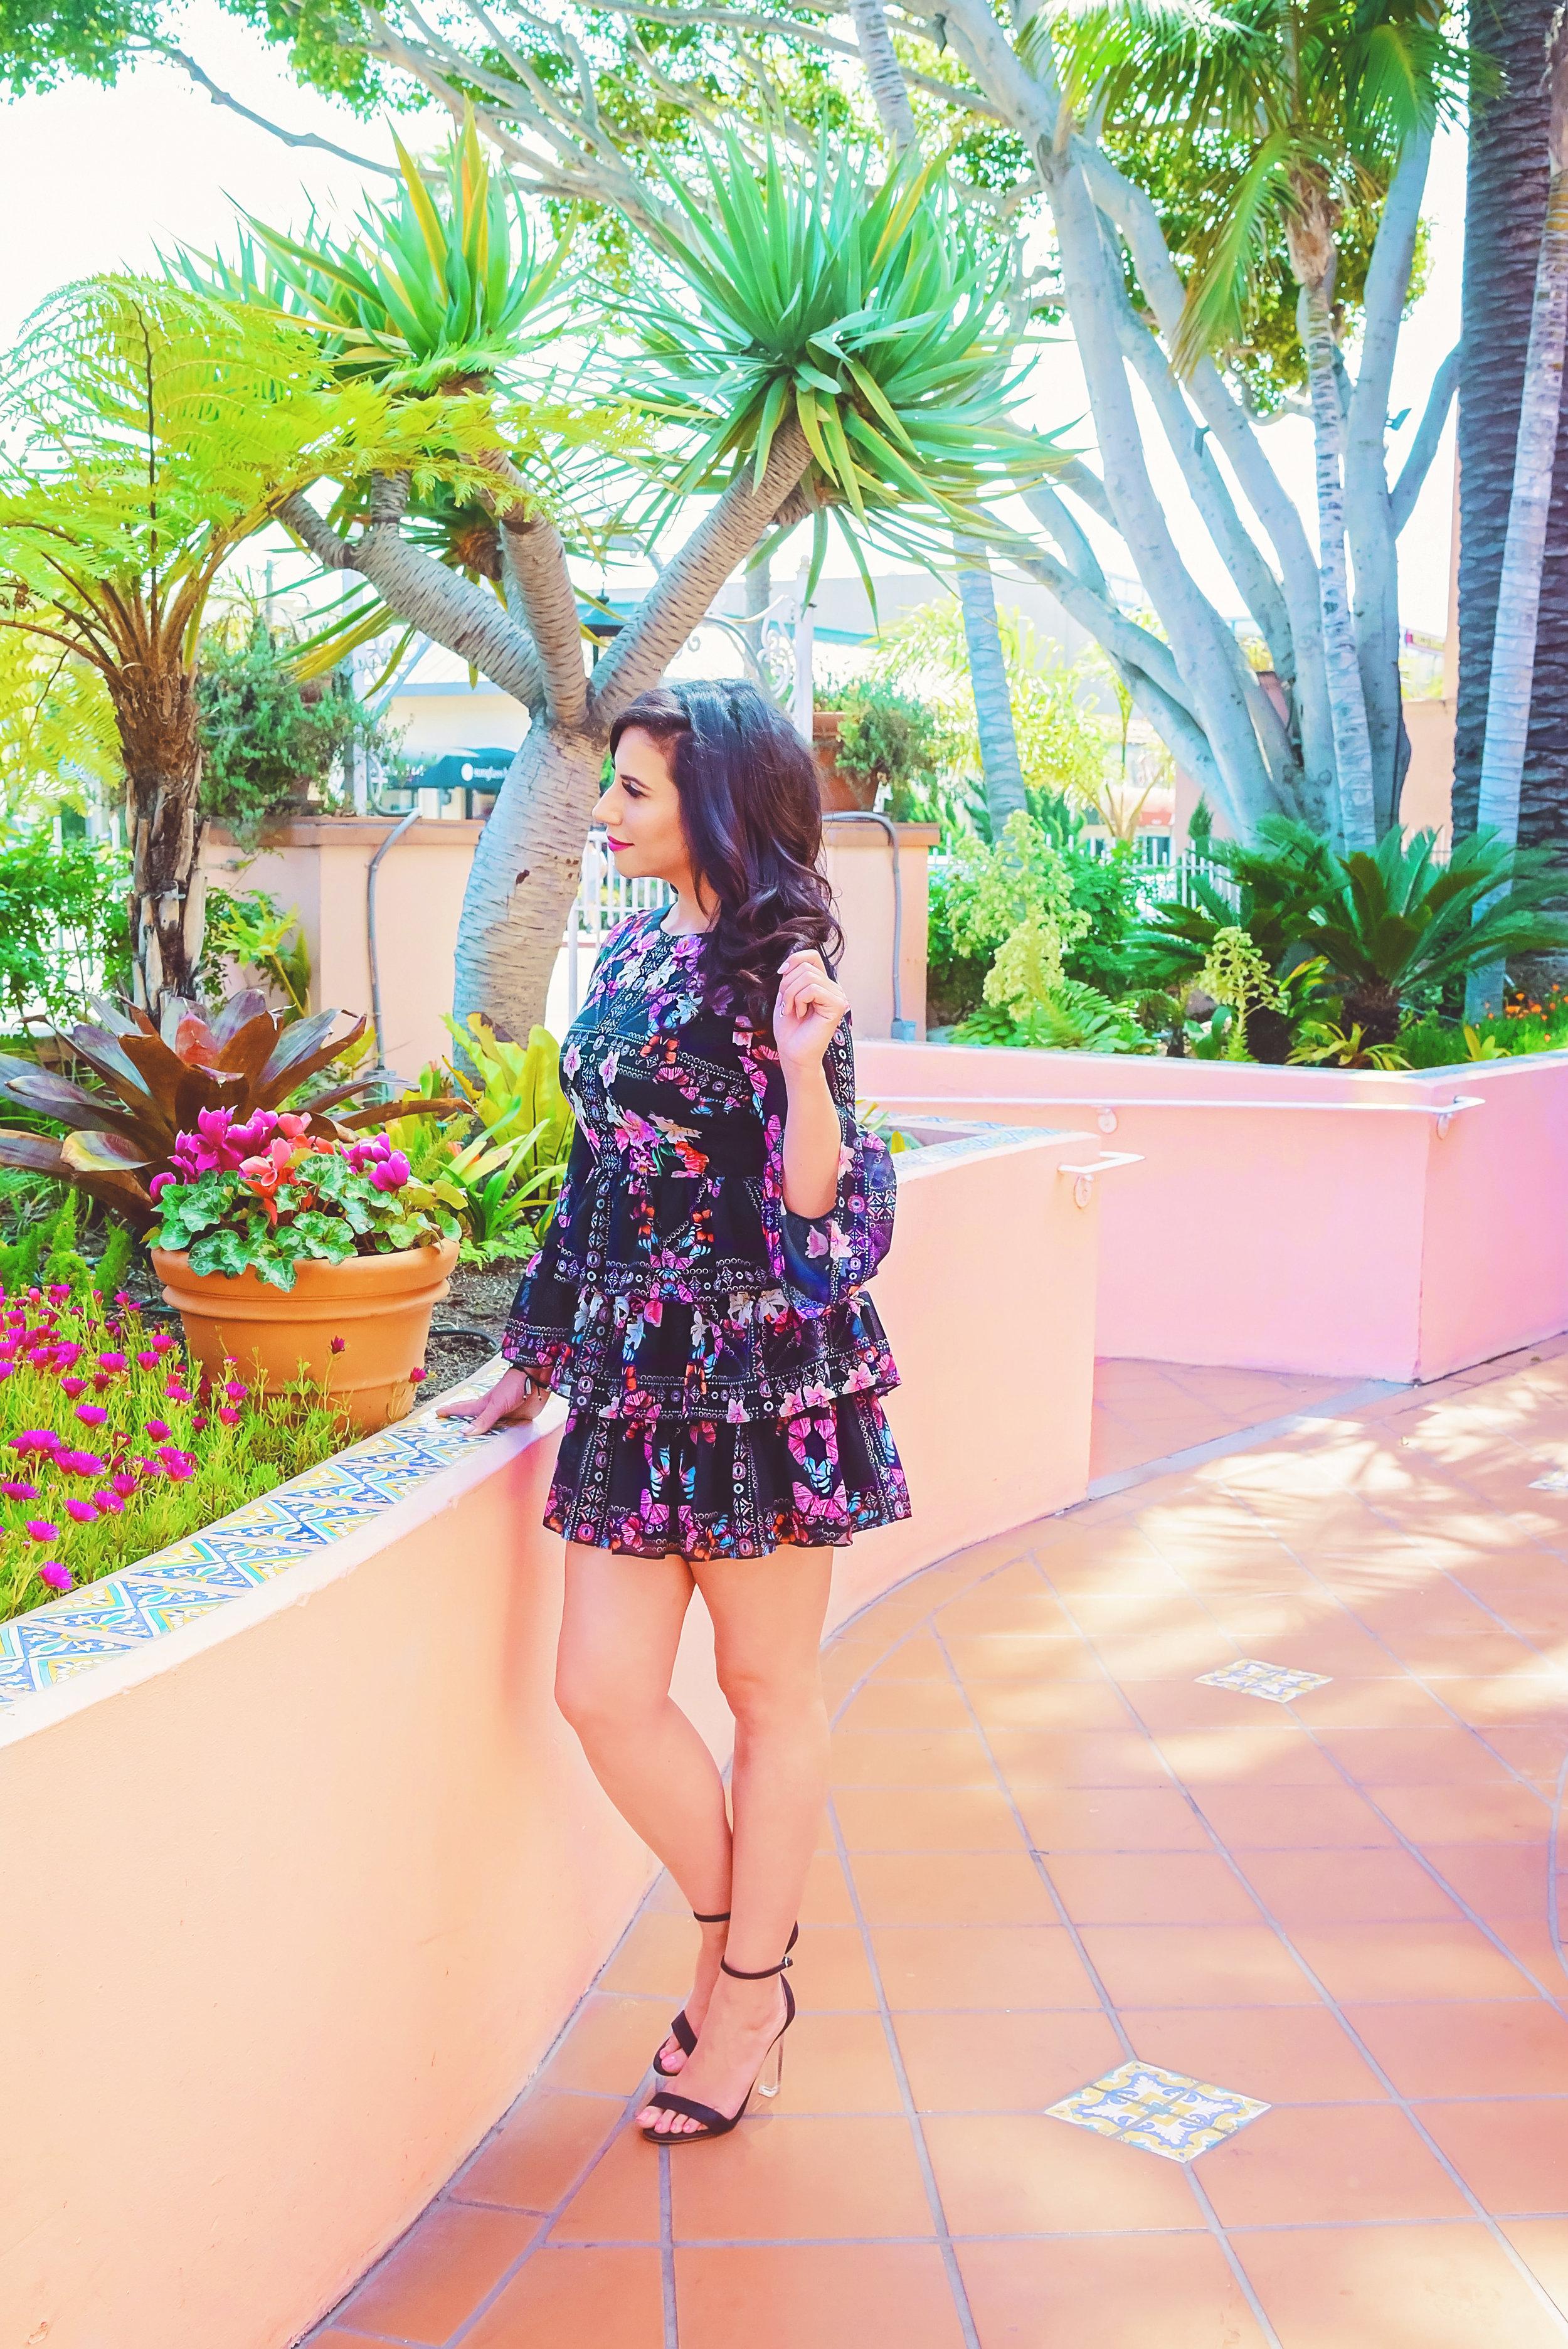 Fashion Dress | Fashion Photography | Lacey O